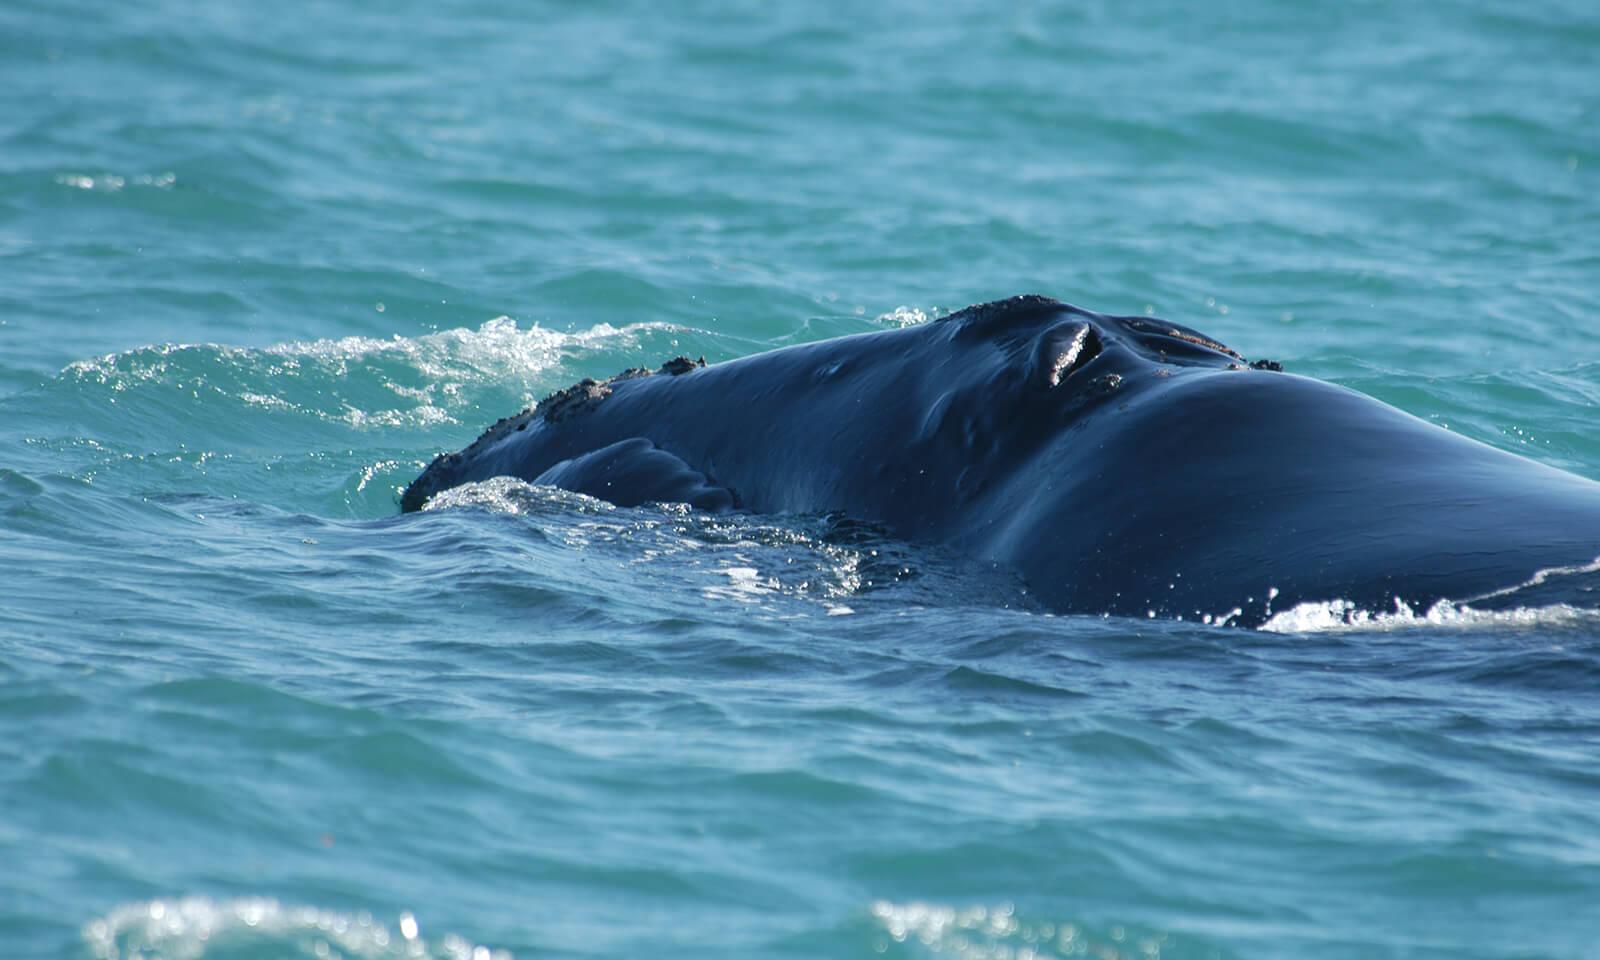 North Atlantic right whale off the Florida Gulf coast